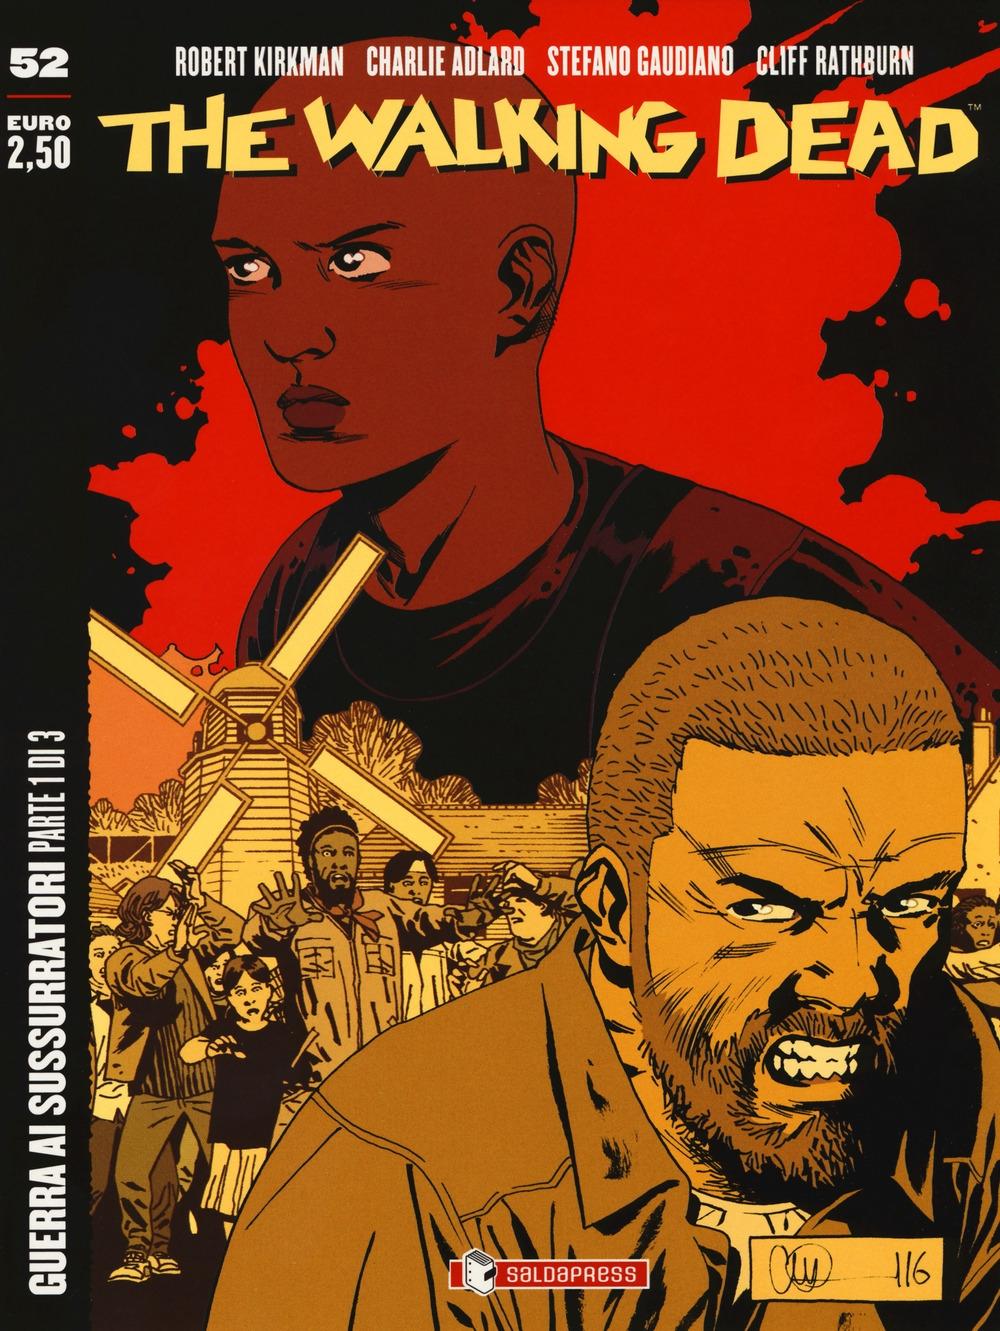 The walking dead. Vol. 52: Guerra ai sussurratori. Parte 1